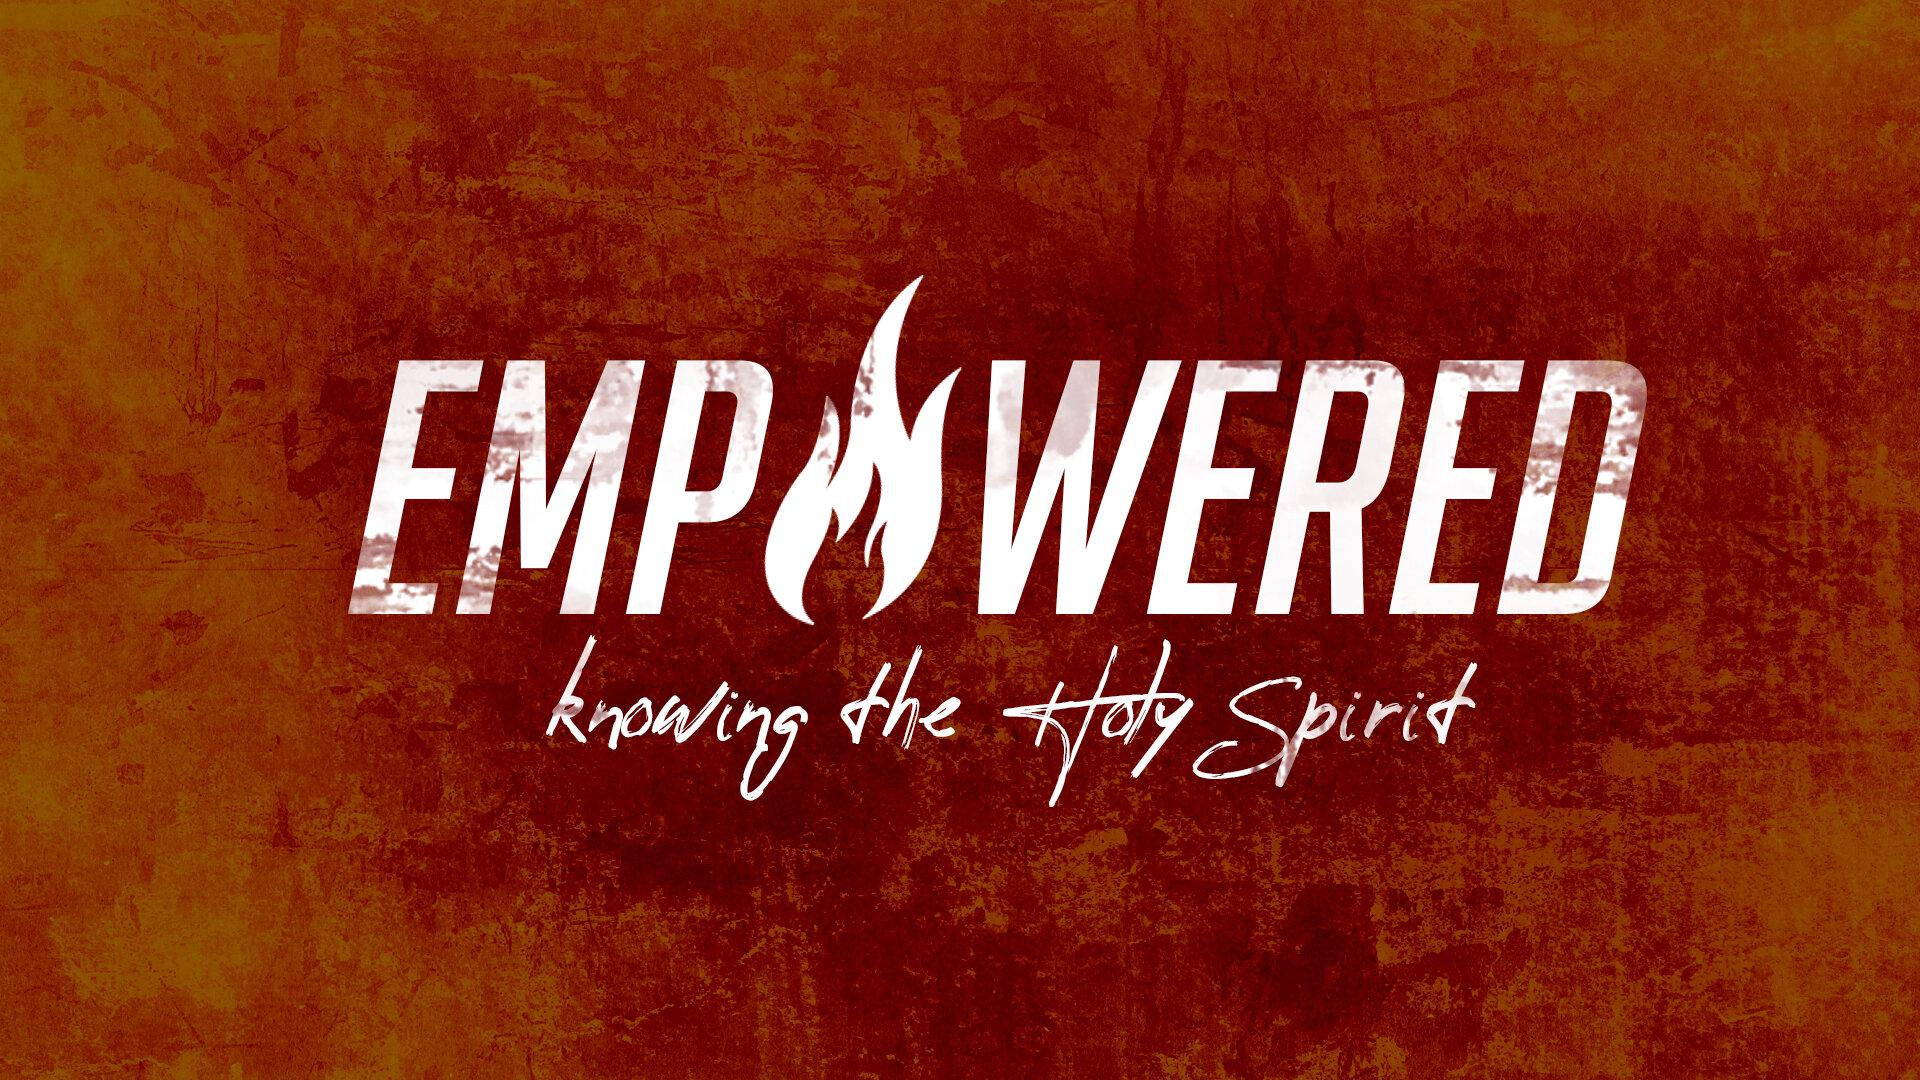 Empowered_fn.jpg